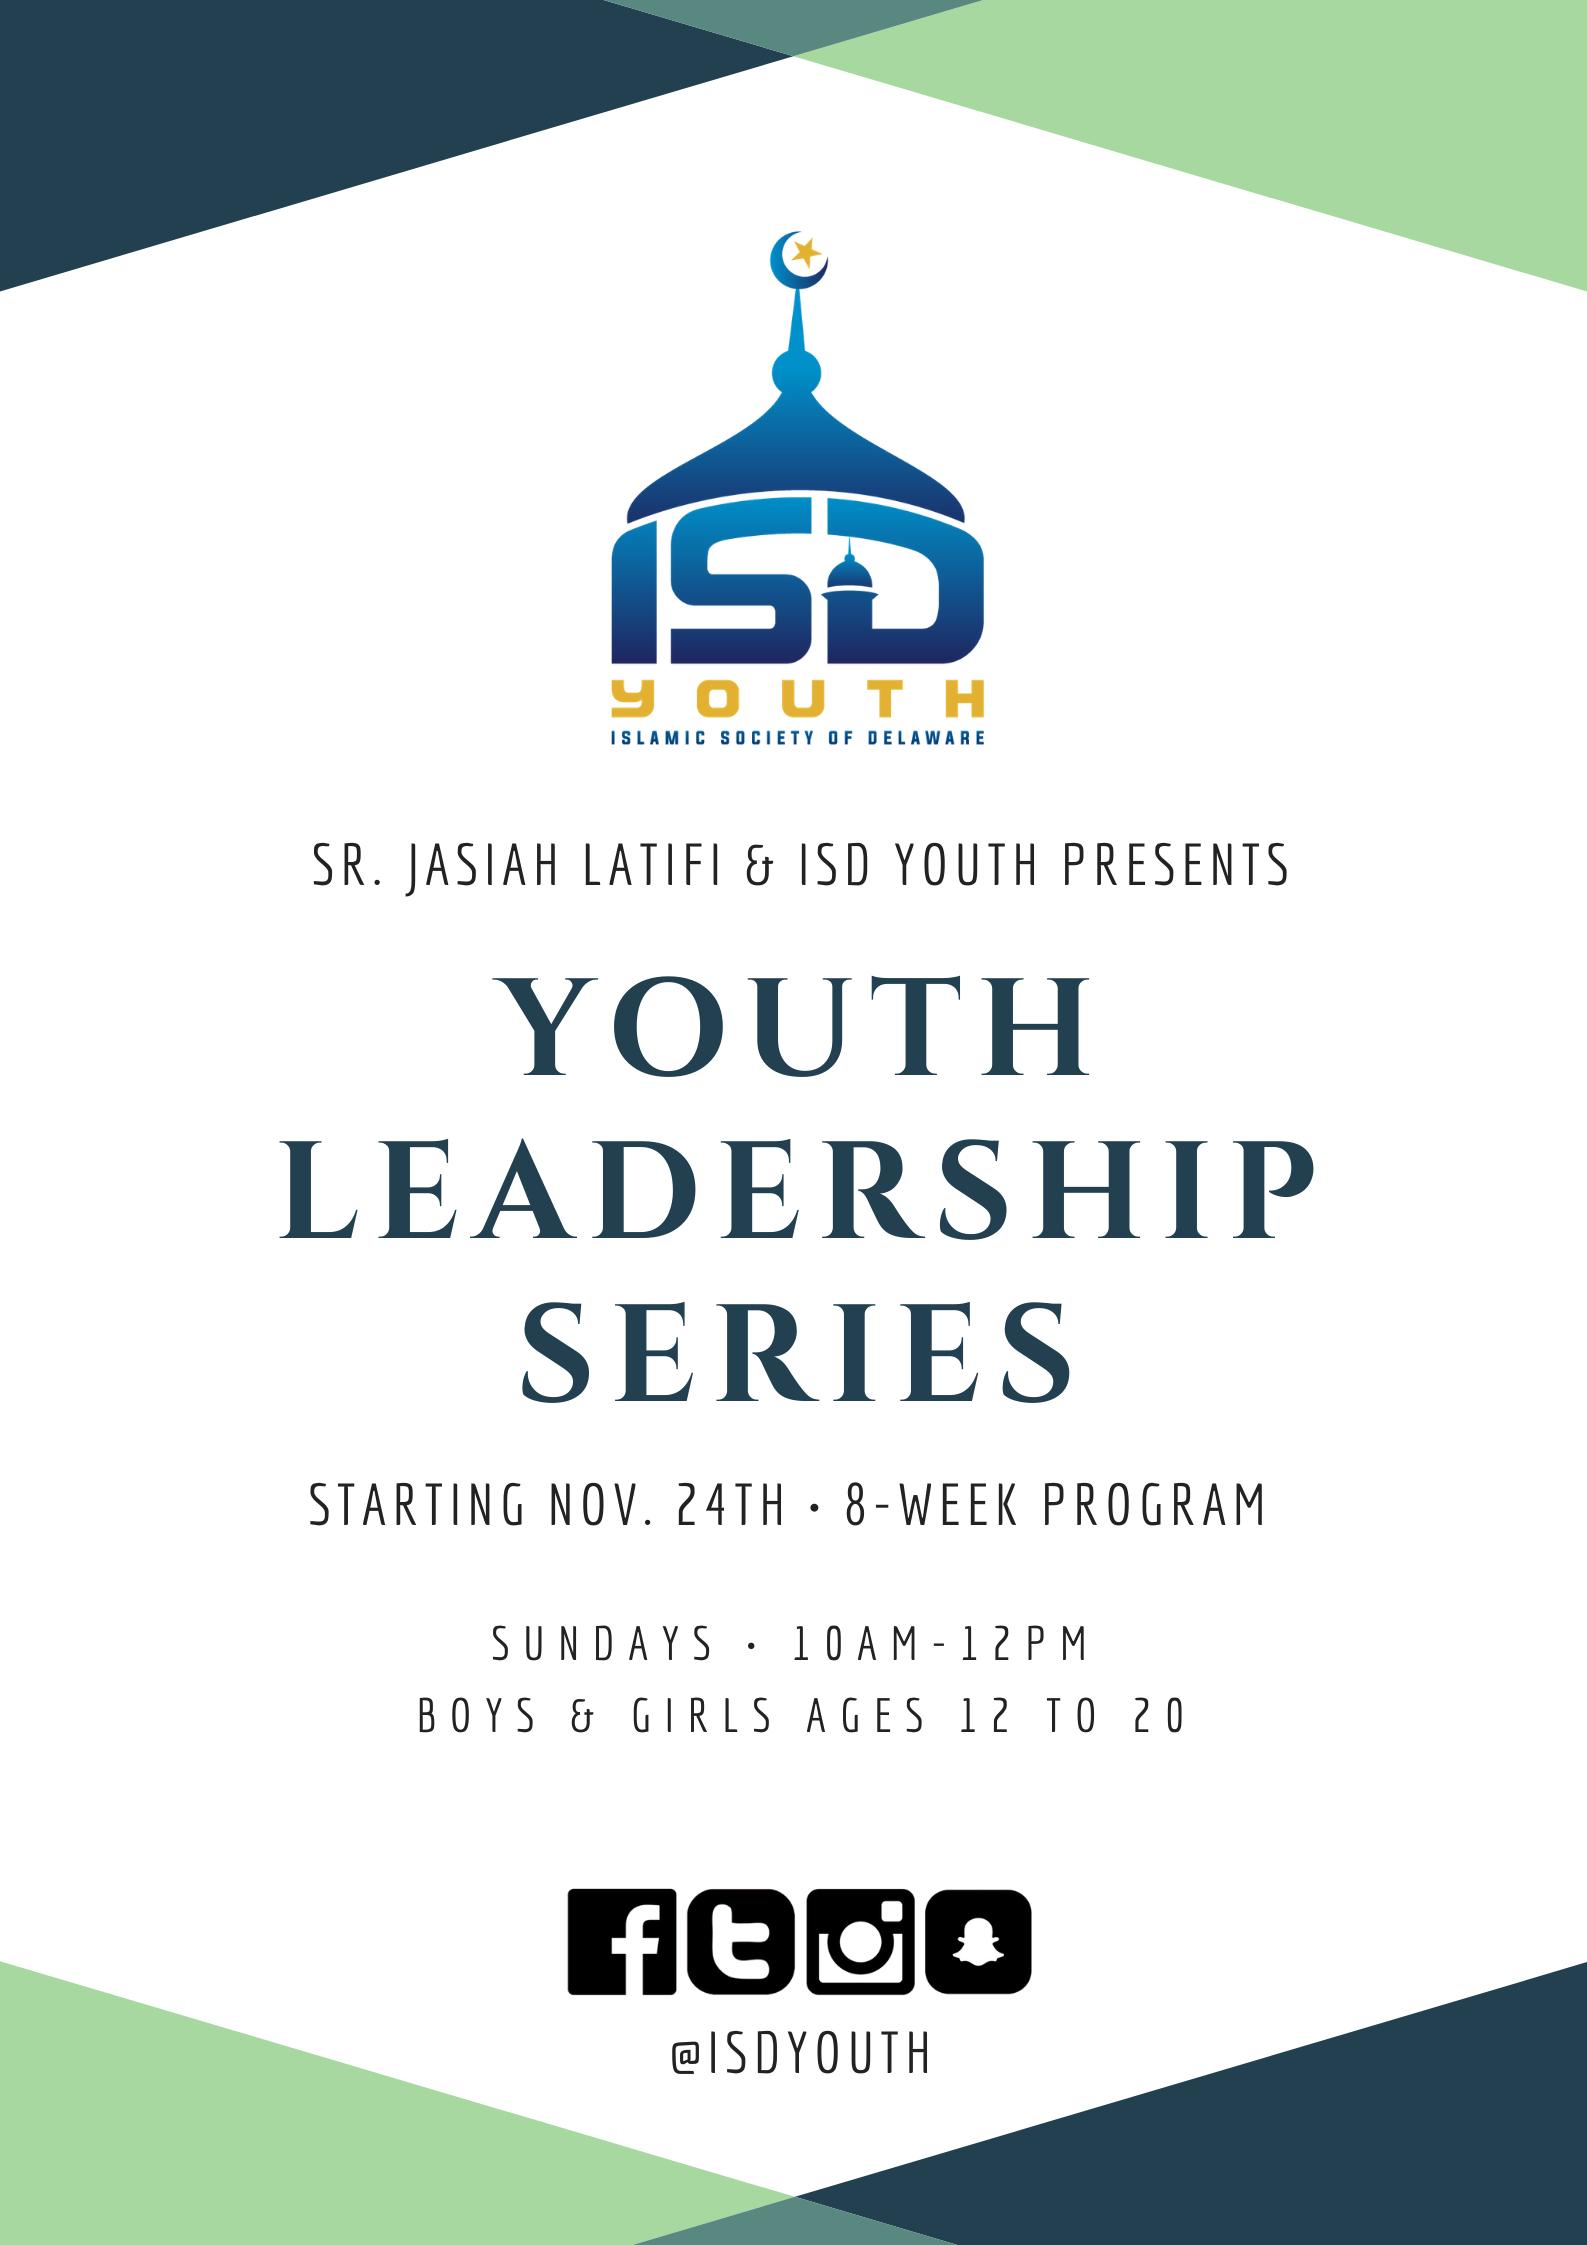 ISD Youth Leadership Series